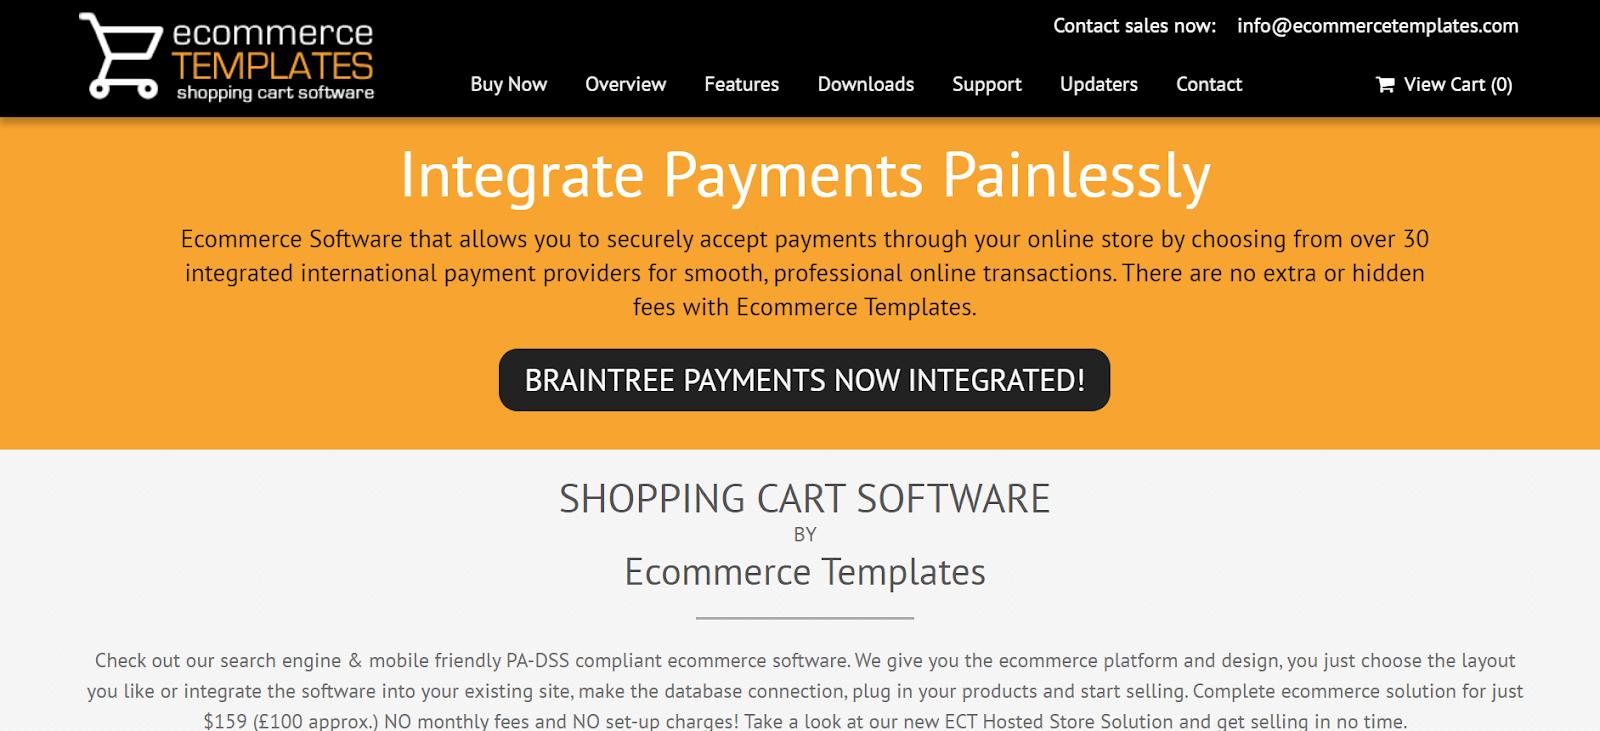 Ecommerce Templates Best eCommerce tools